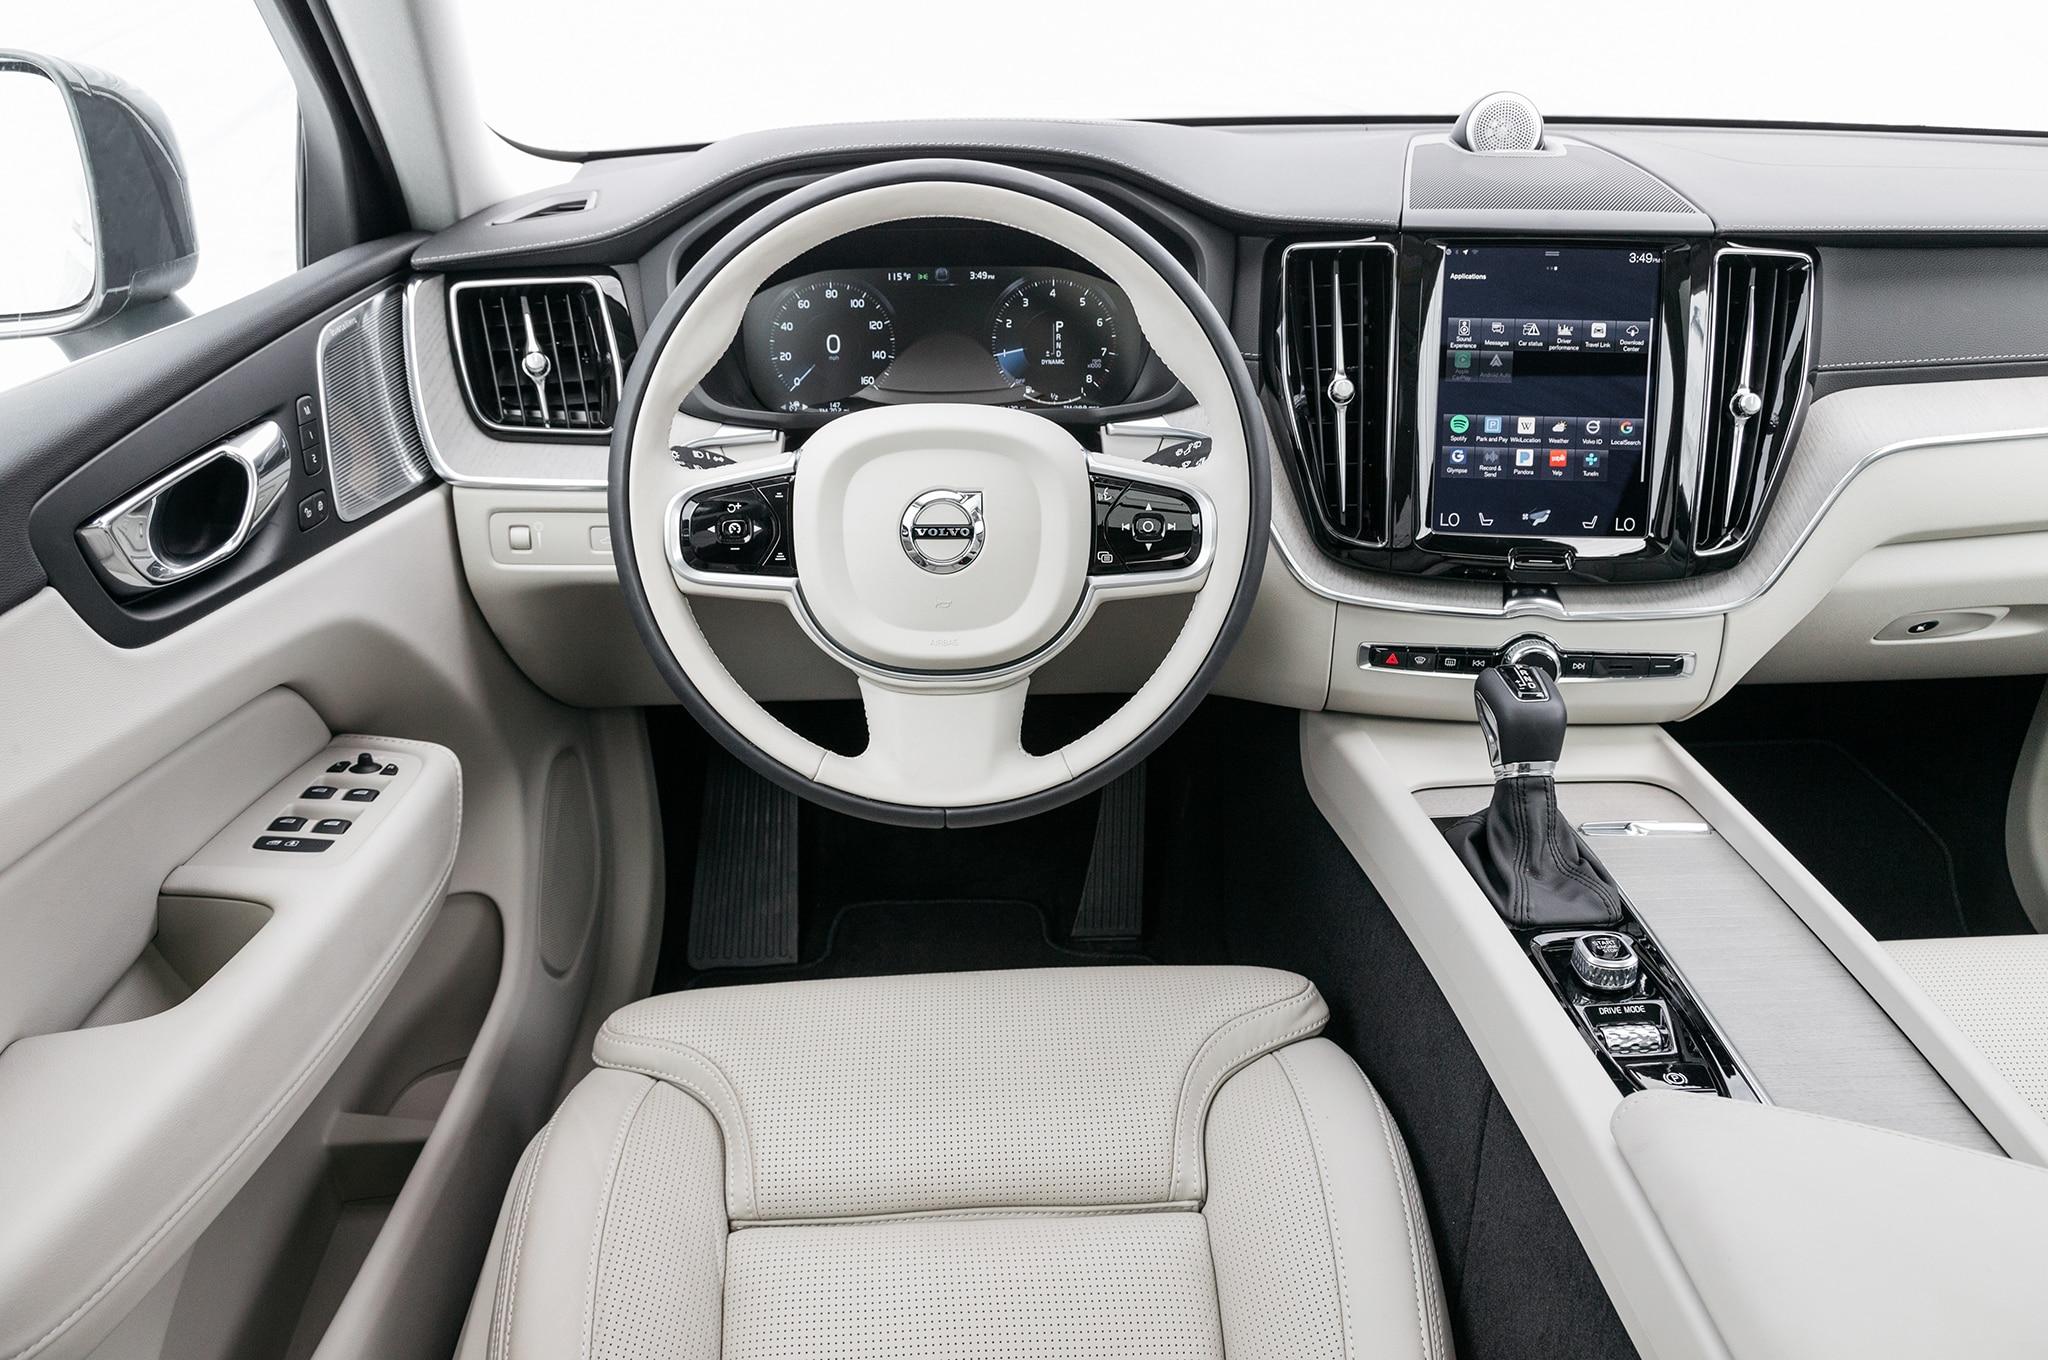 2018 Volvo Xc60 Interior Detail Motor Trend En Espanol